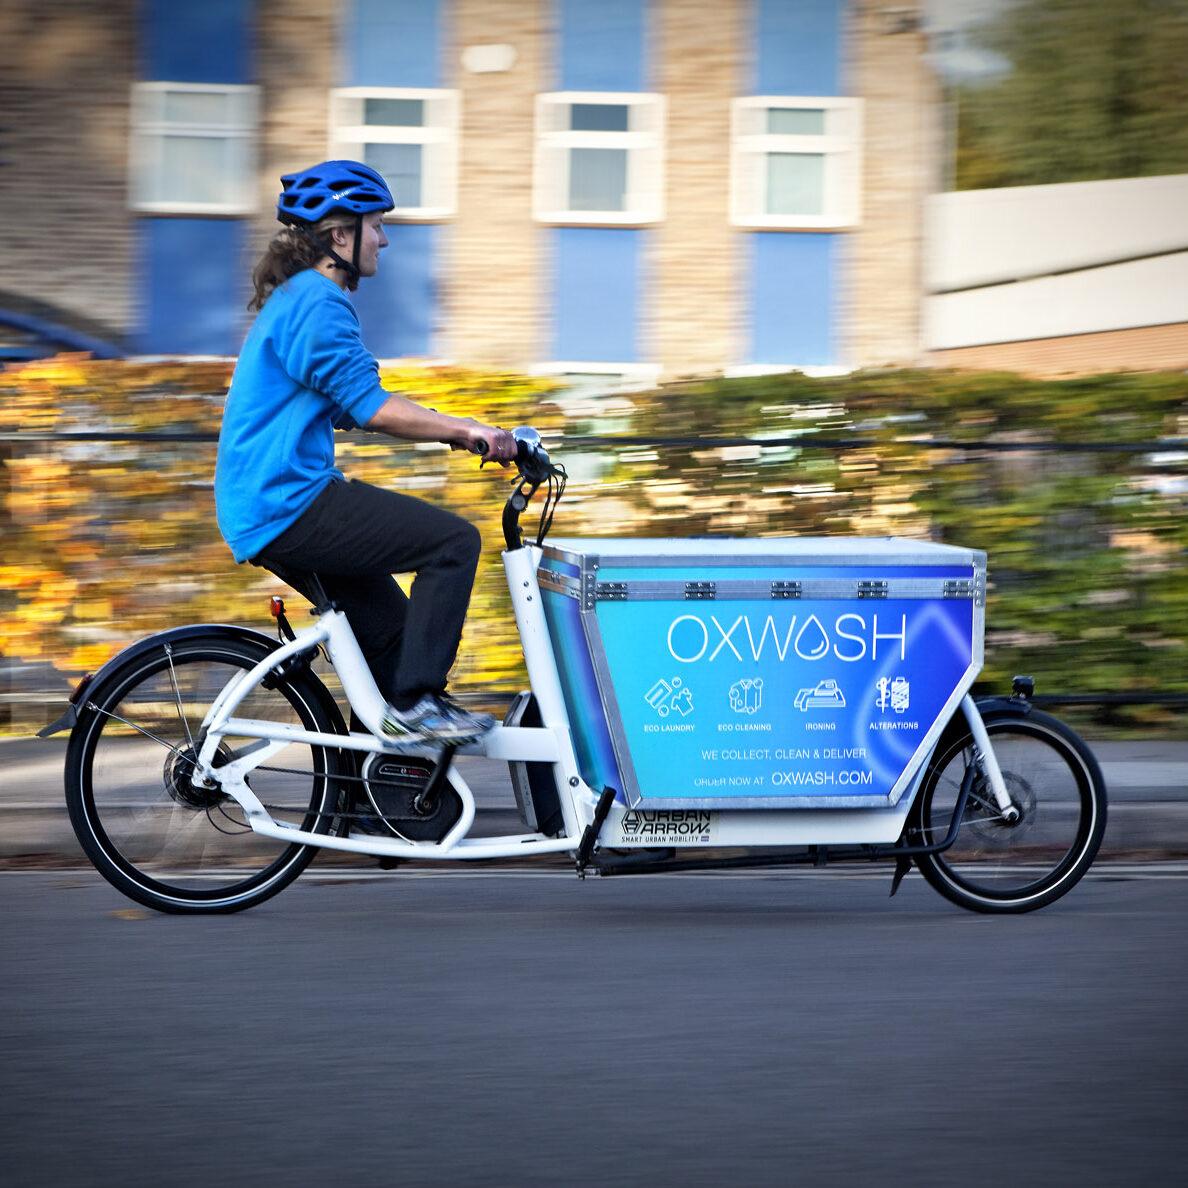 Oxwash image of rider on cargo bike delivering laundry